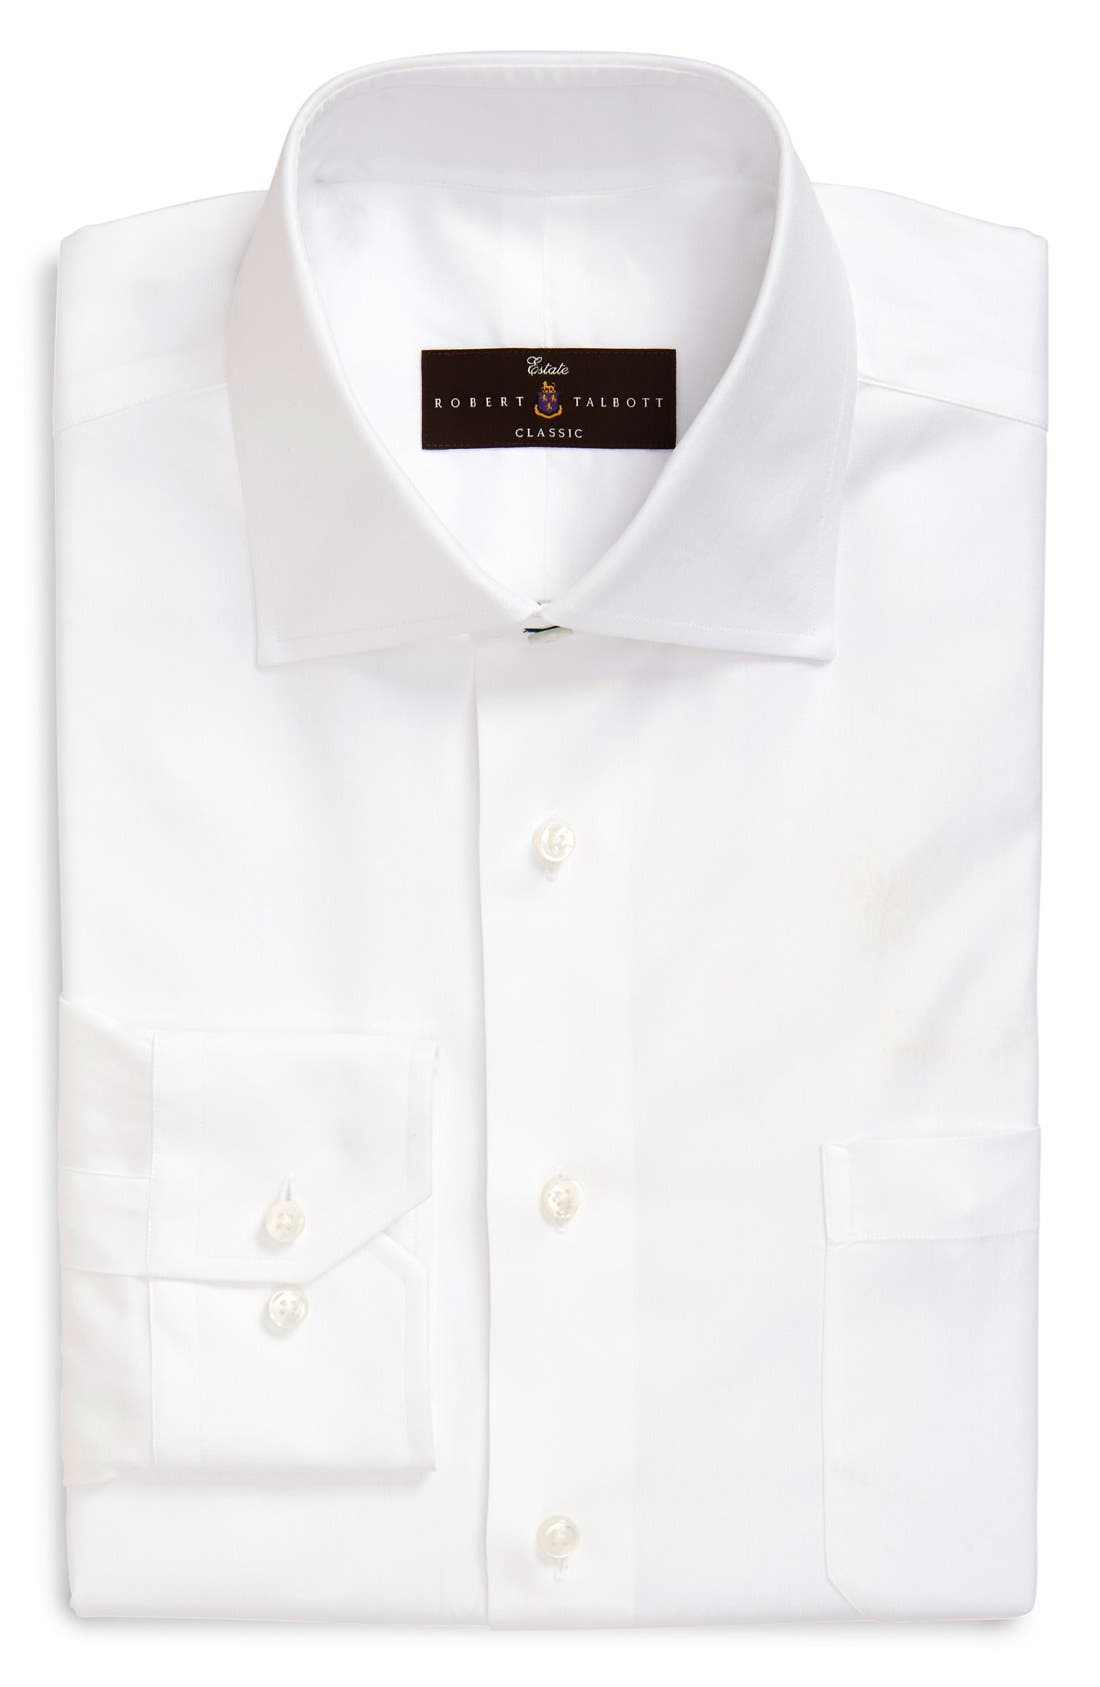 Main Image - Robert Talbott Classic Fit Solid Dress Shirt